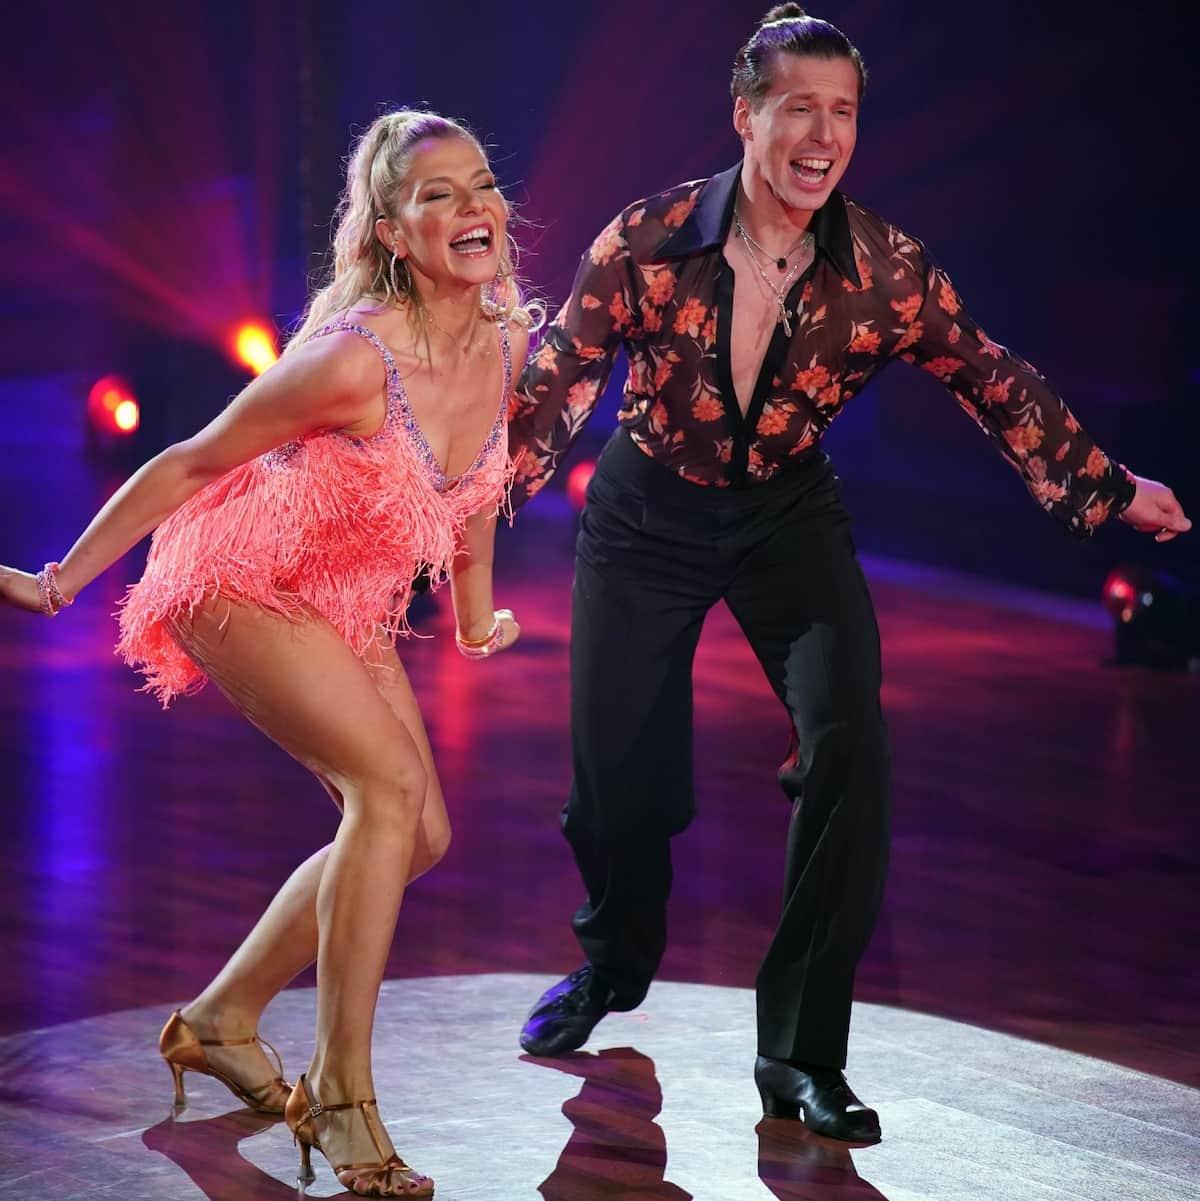 Valentina Pahde - Valentin Lusin bei Let's dance am 26.3.2021